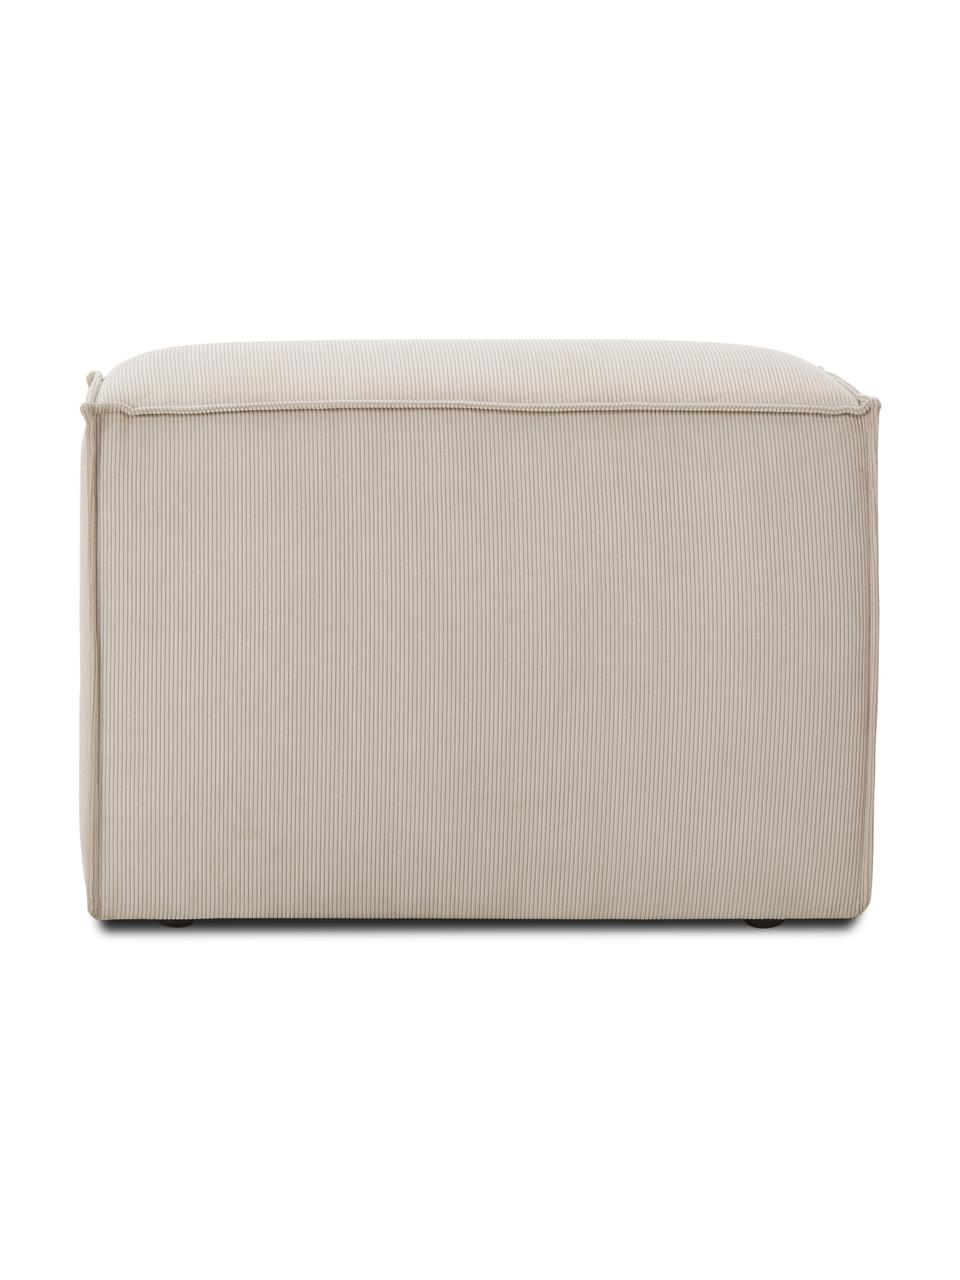 Middelste module Lennon in beige van corduroy, Bekleding: corduroy (92% polyester, , Frame: massief grenenhout, multi, Poten: kunststof De poten bevind, Corduroy beige, 89 x 119 cm